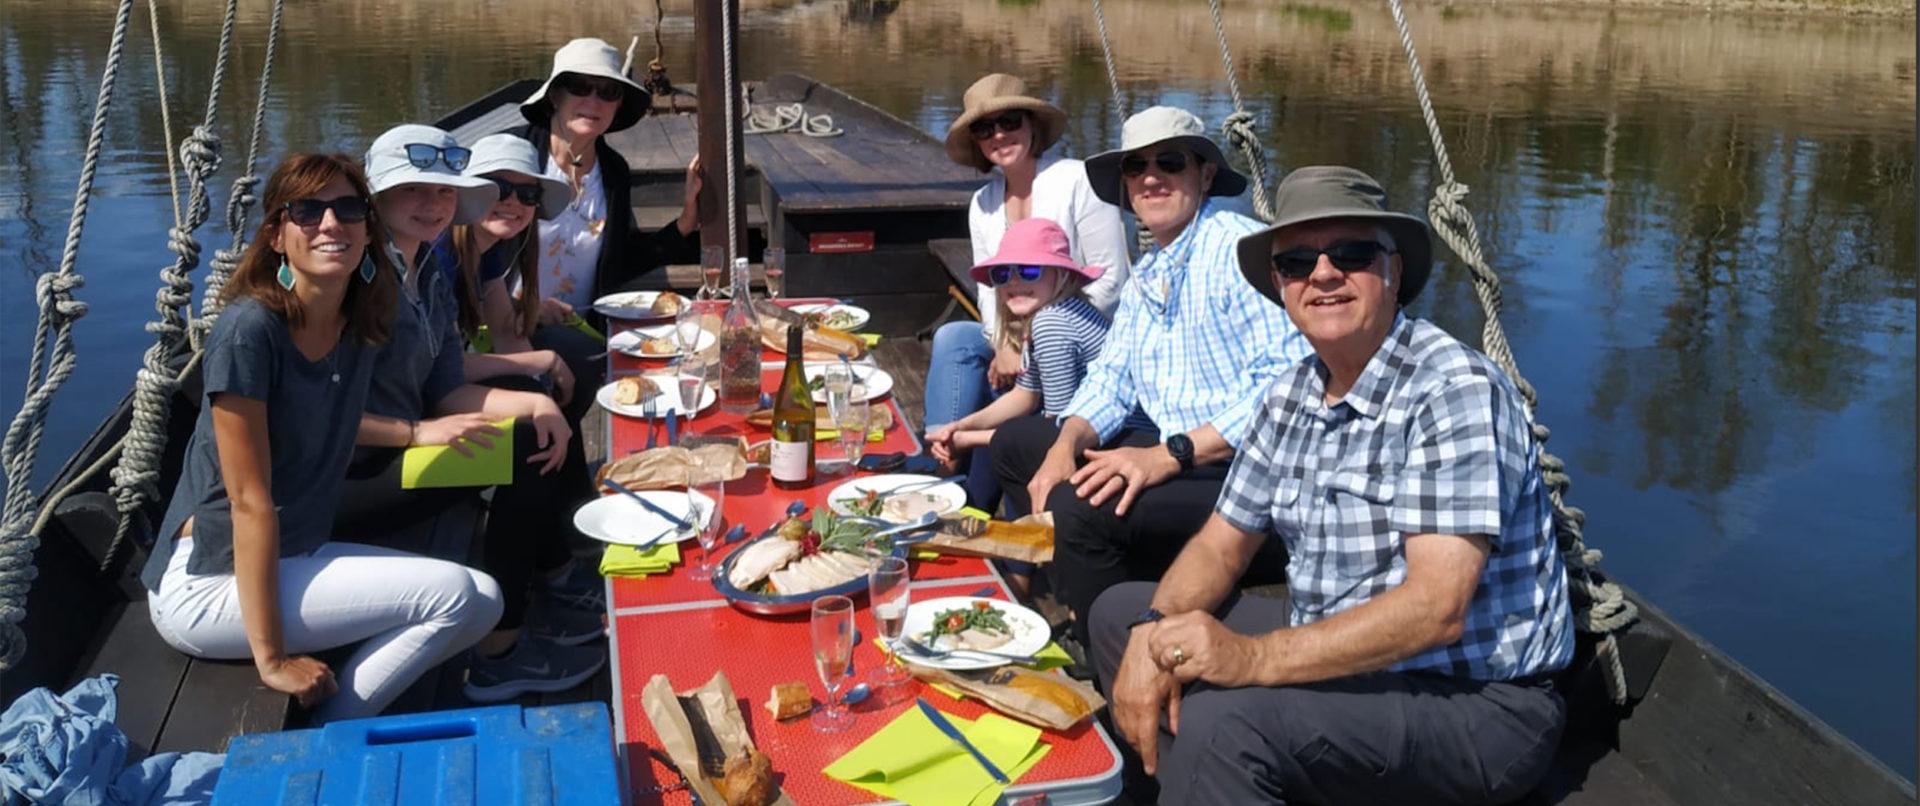 family-escape-in-the-loire-valley-tour-picnic